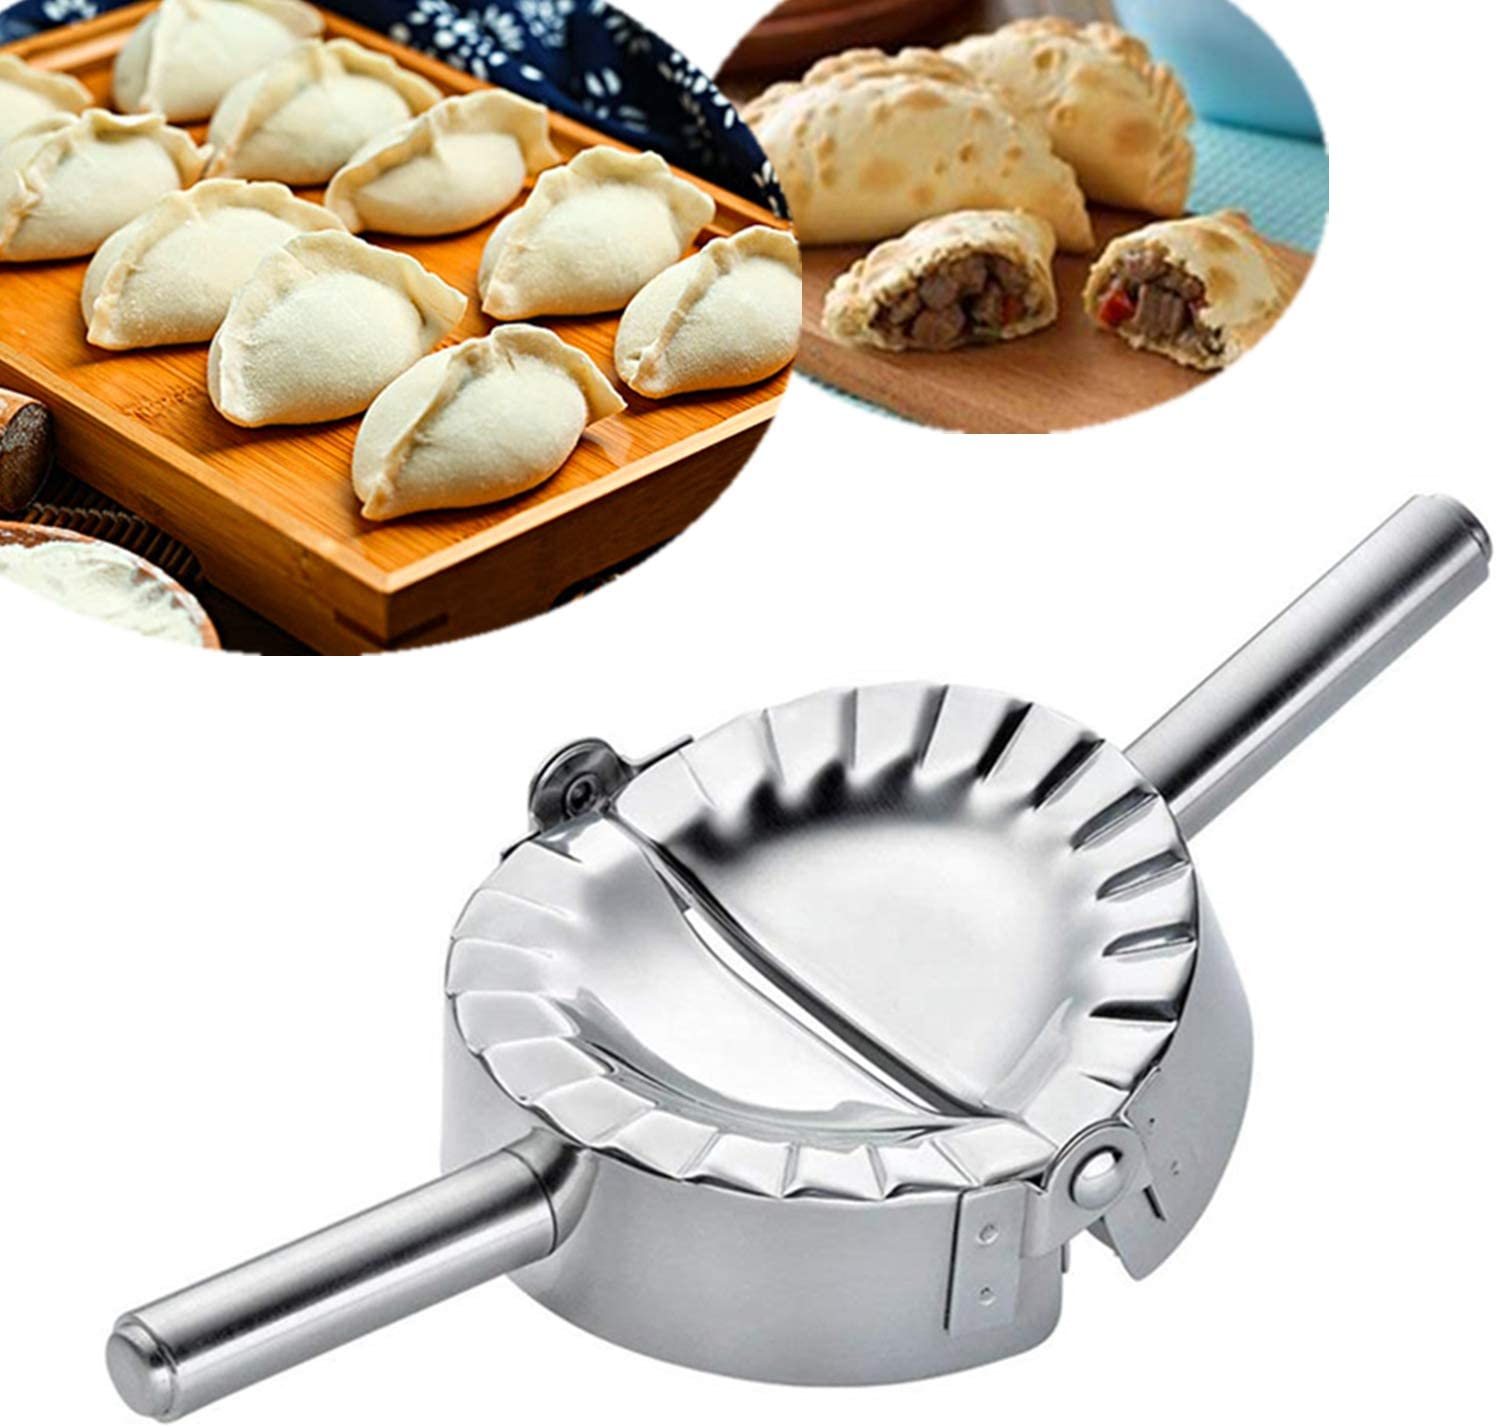 HLYCare Stainless Max 58% OFF Steel Ravioli Mold Dumpling X-La Pierogi Time sale Maker